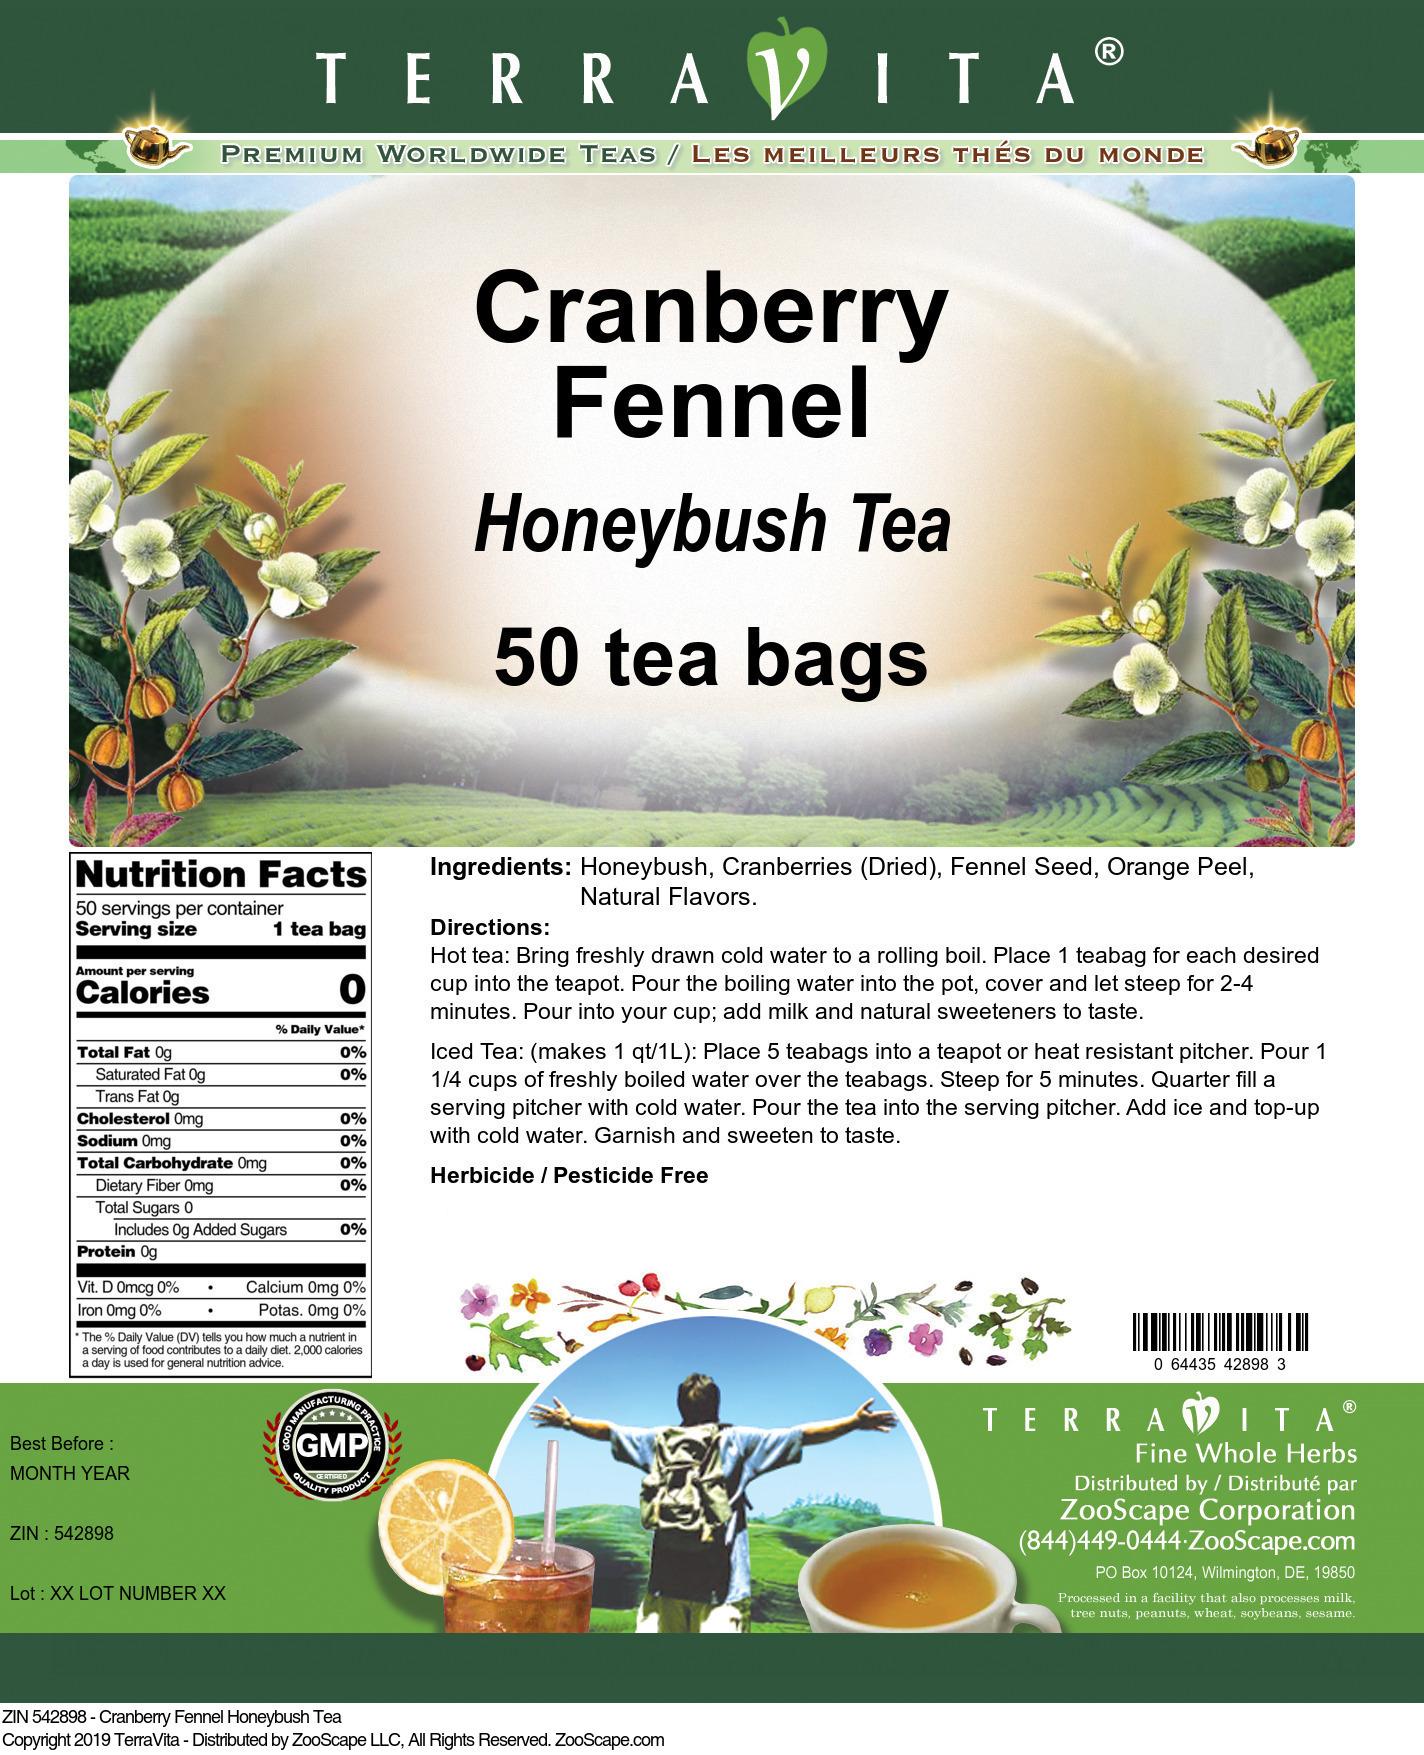 Cranberry Fennel Honeybush Tea